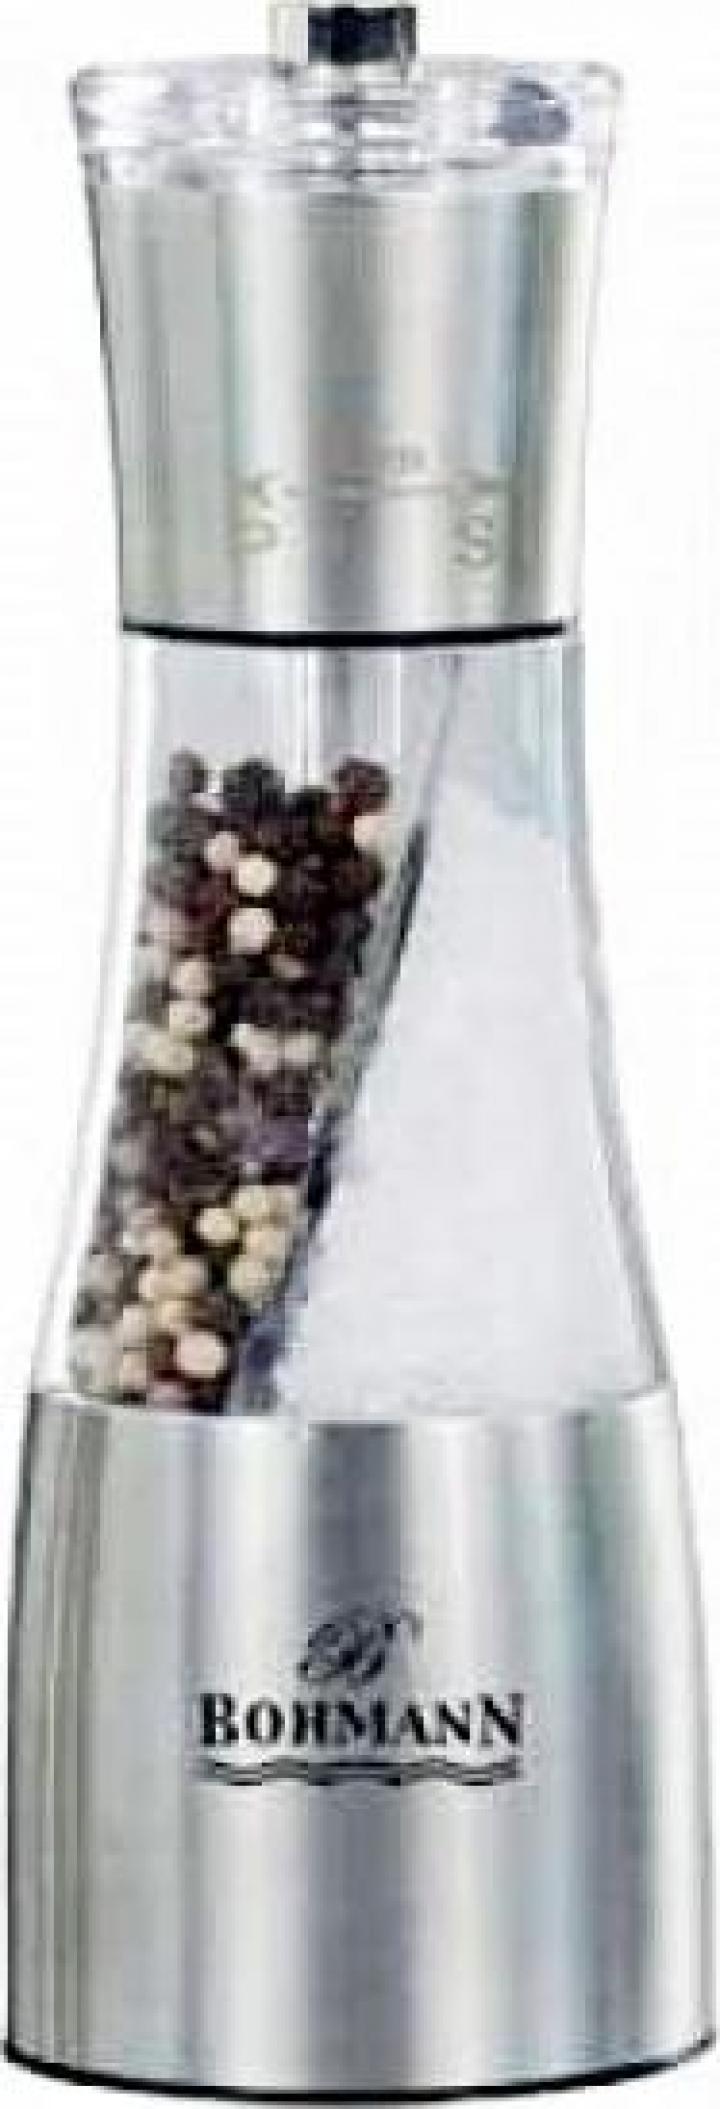 Rasnita condimente 2in1 manuala Bohmann BH7801